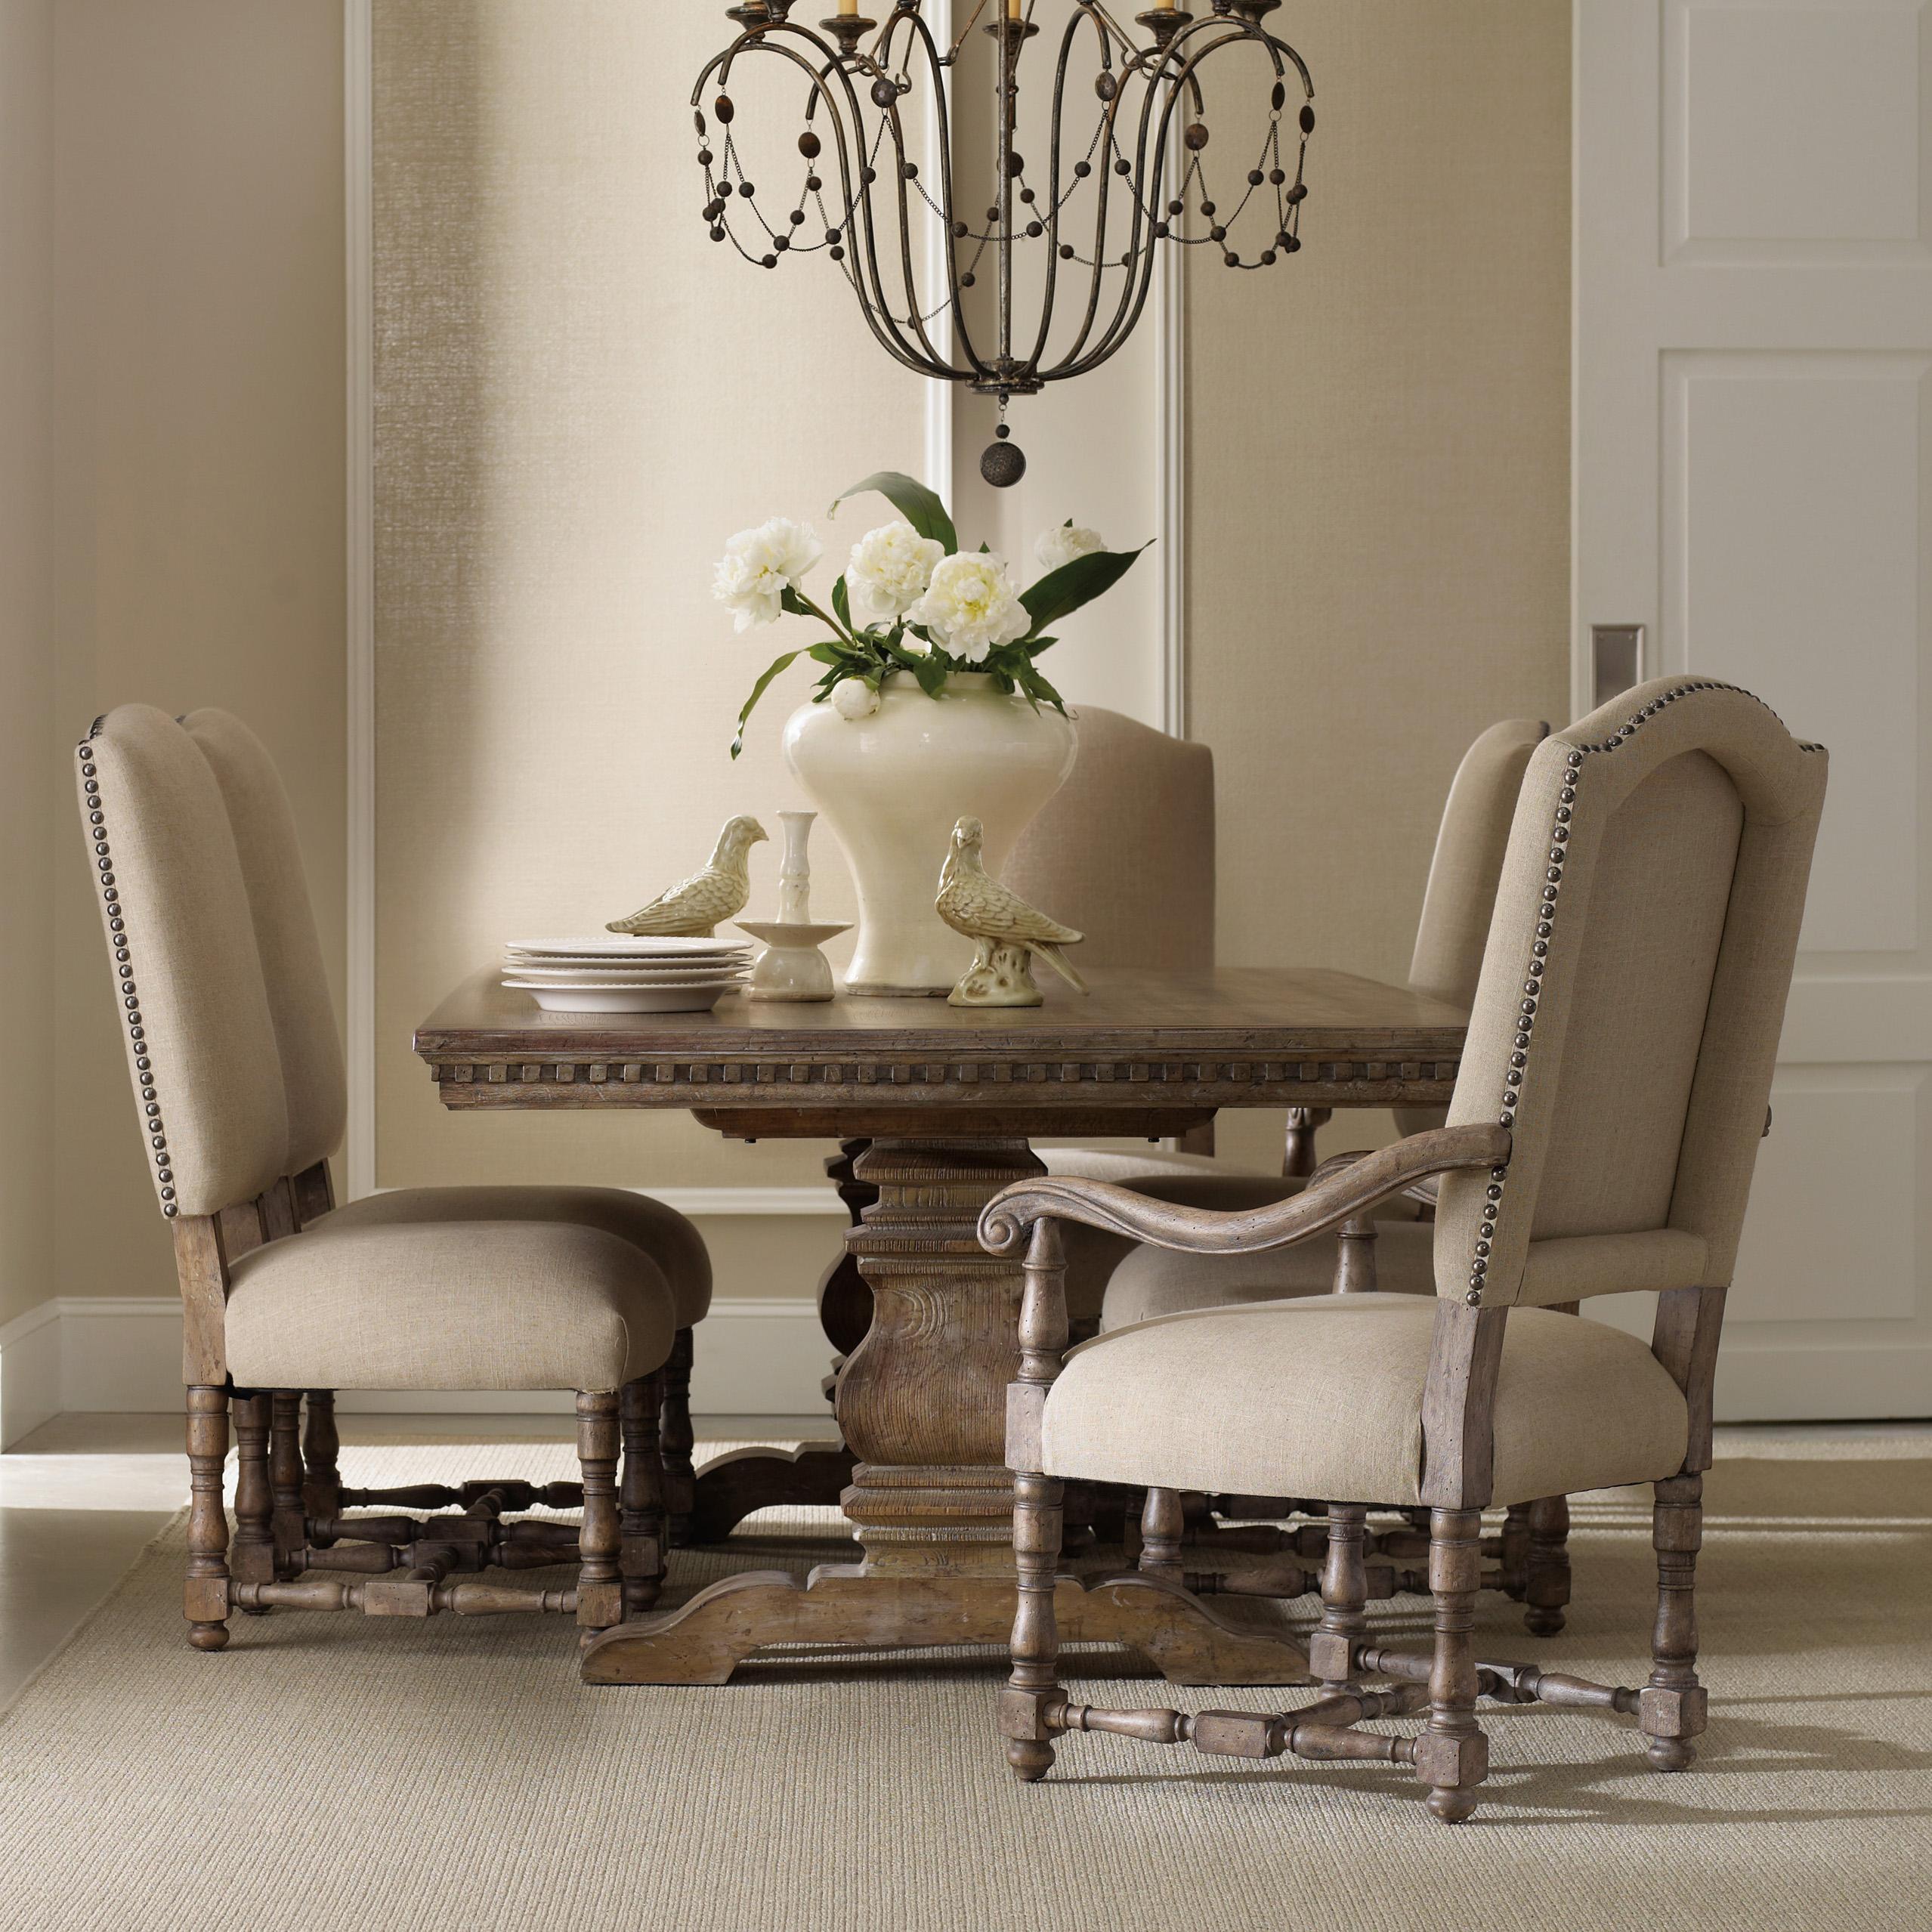 upholstered chairs for dining room adjustable drafting chair hooker furniture sorella formal set with rectangular table sorellarectangular